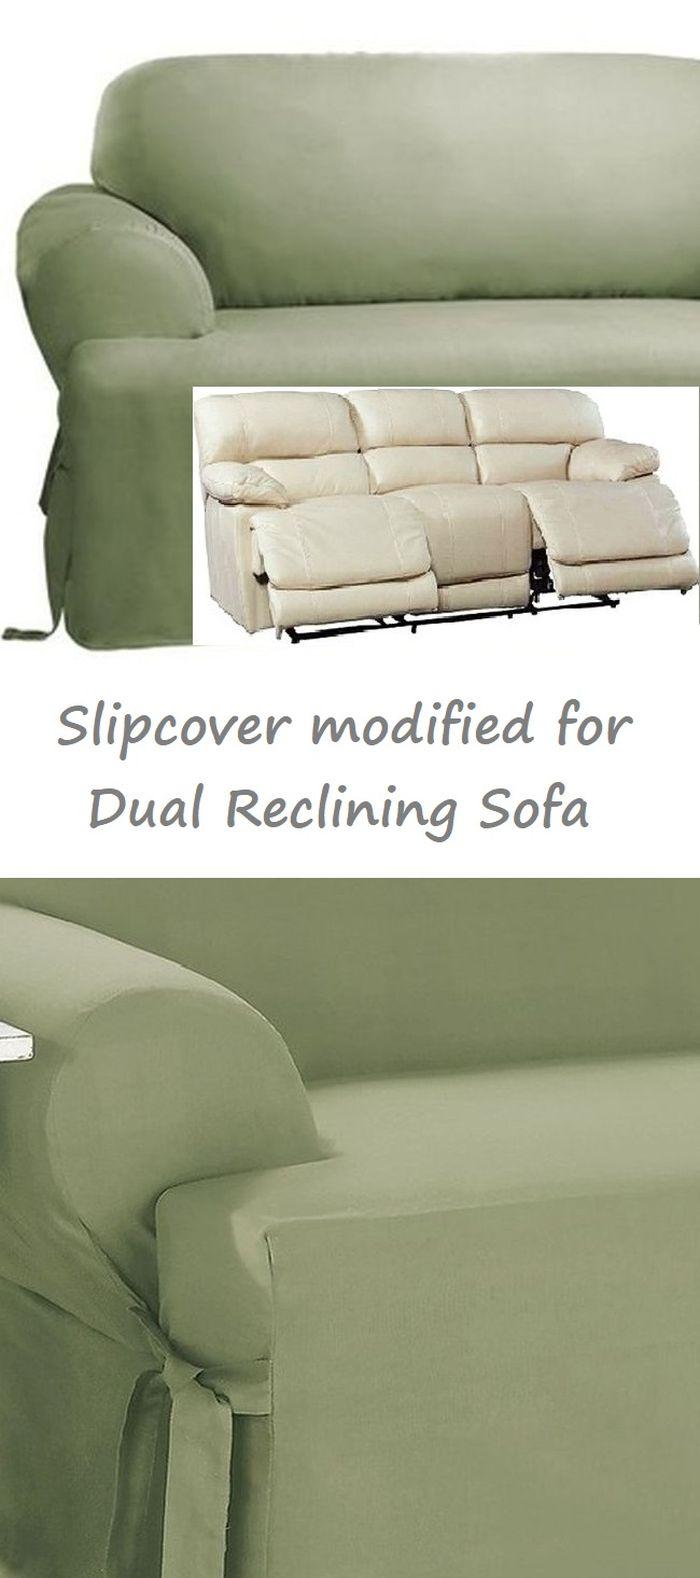 Dual Reclining Sofa Slipcover T Cushion Cotton Sage Green